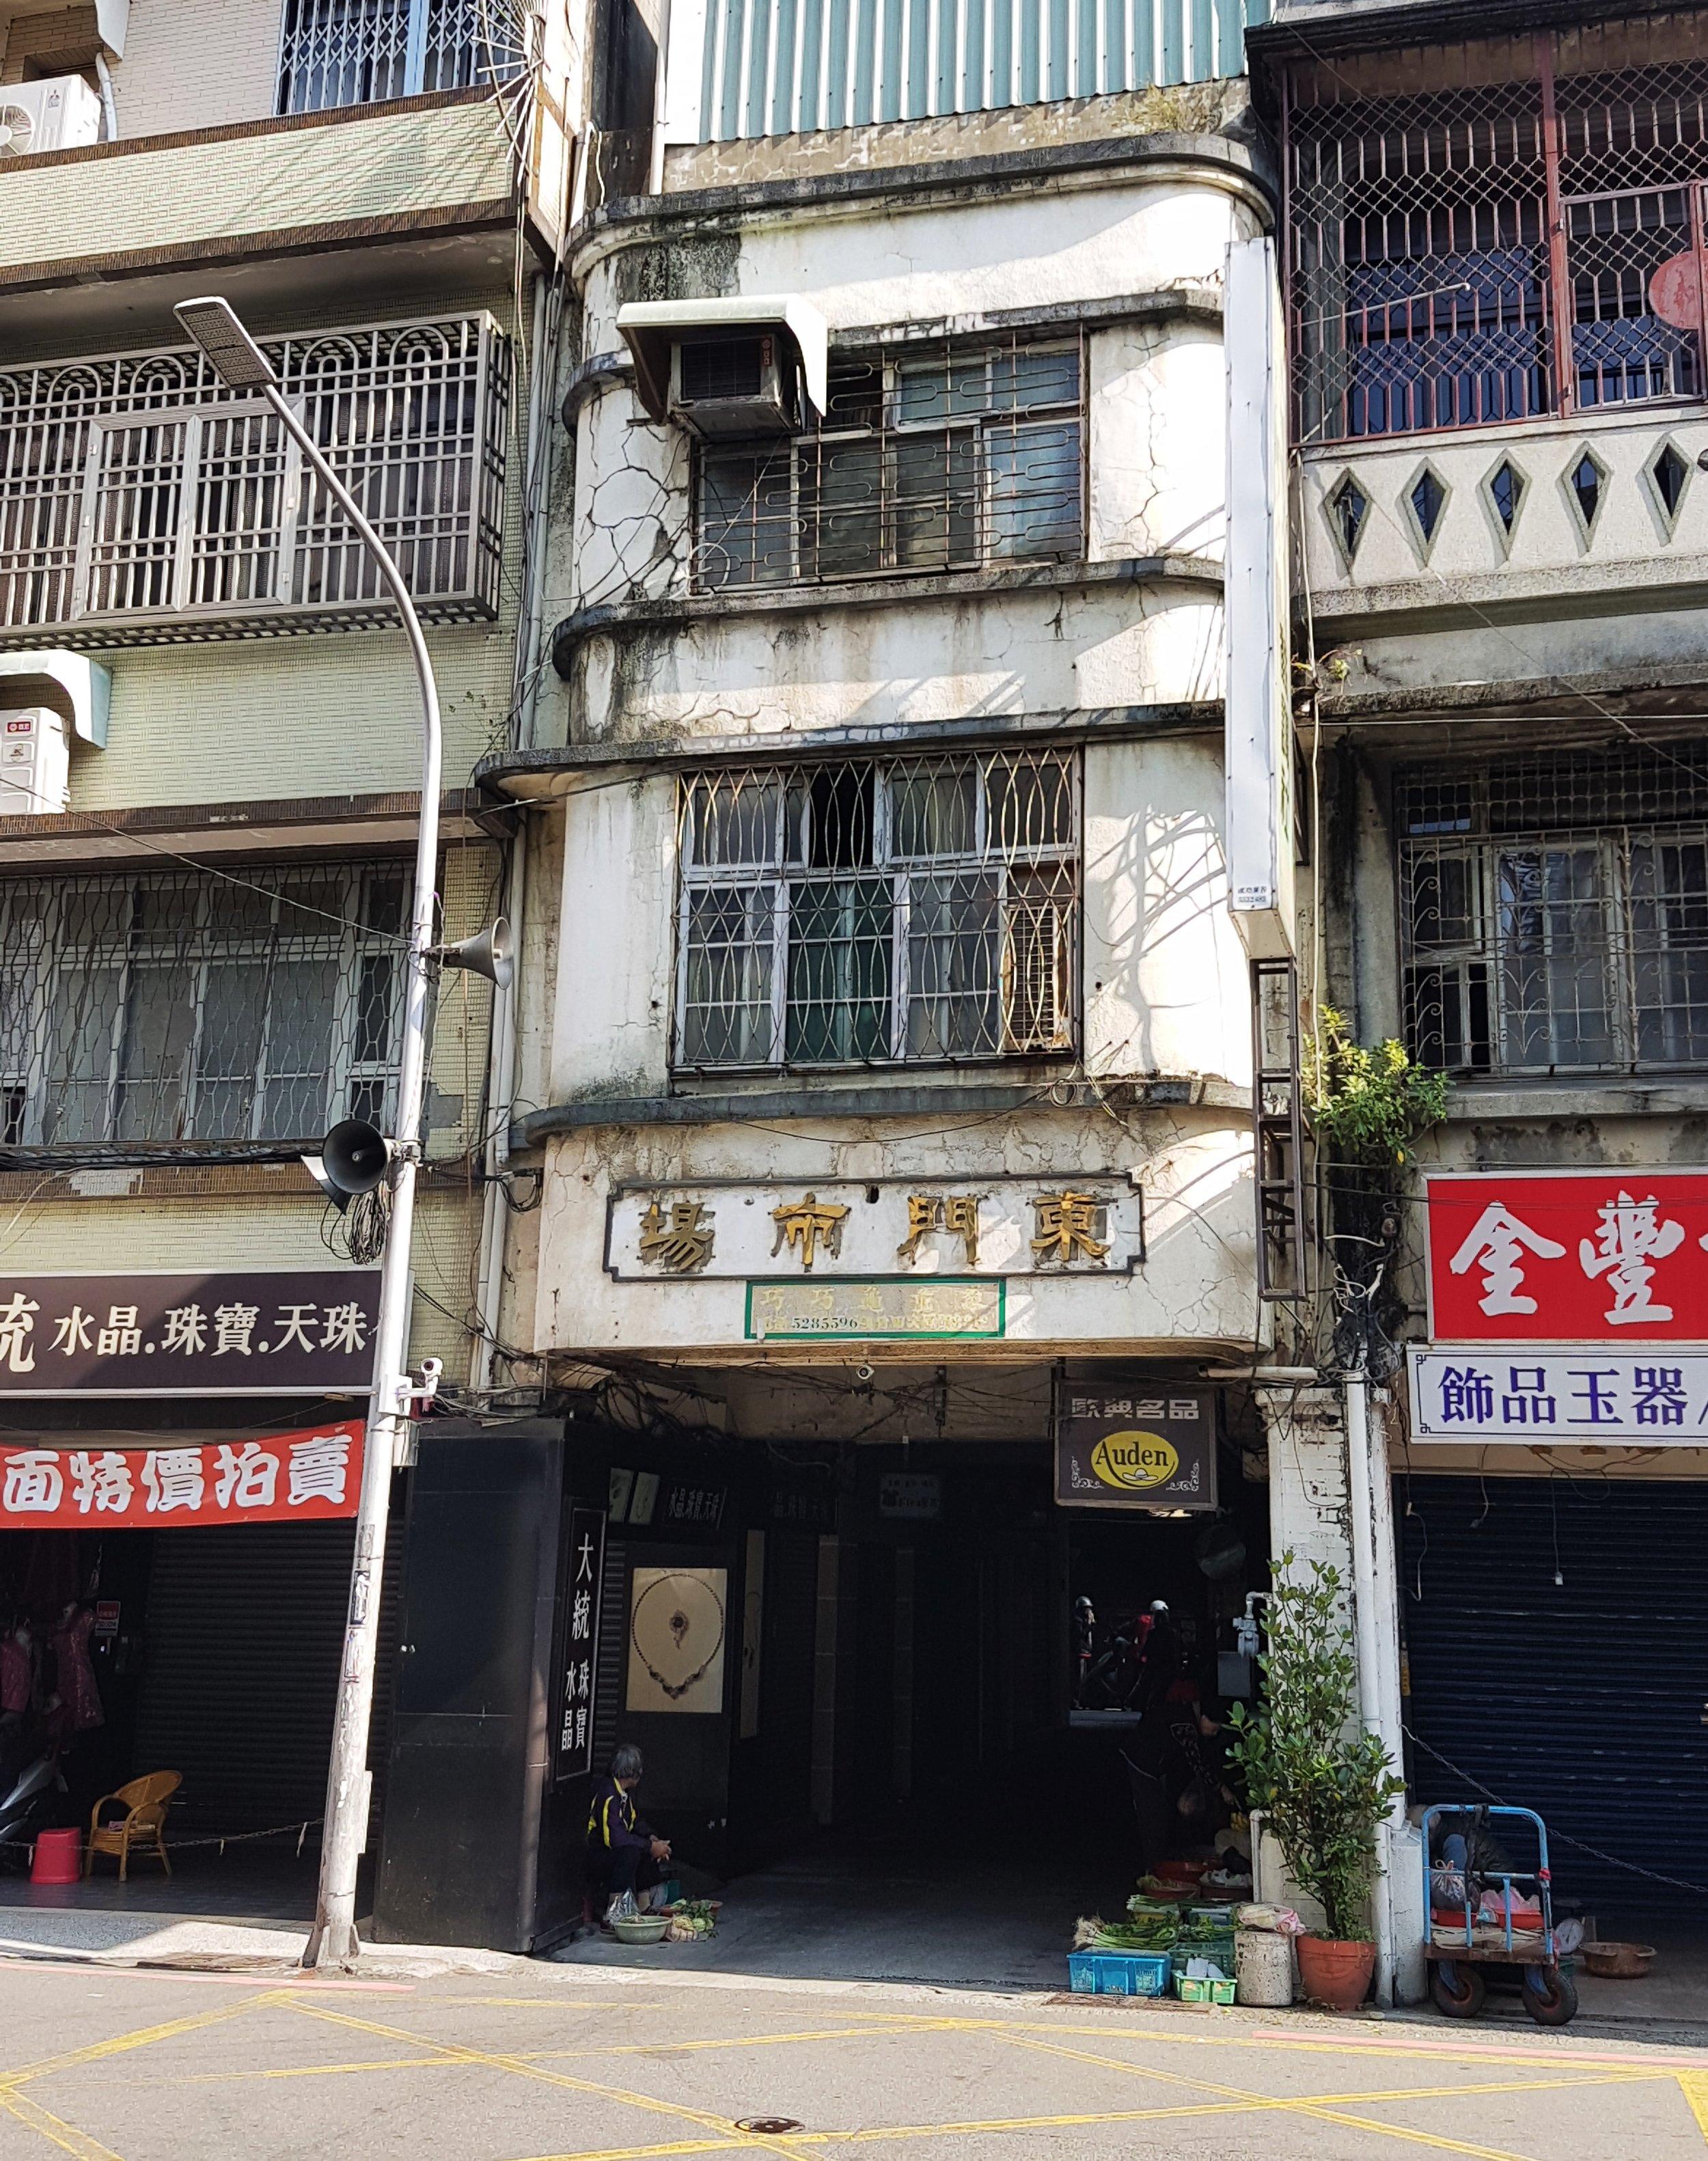 Dongmen Market, Hsinchu. Entrance and inner courtyard